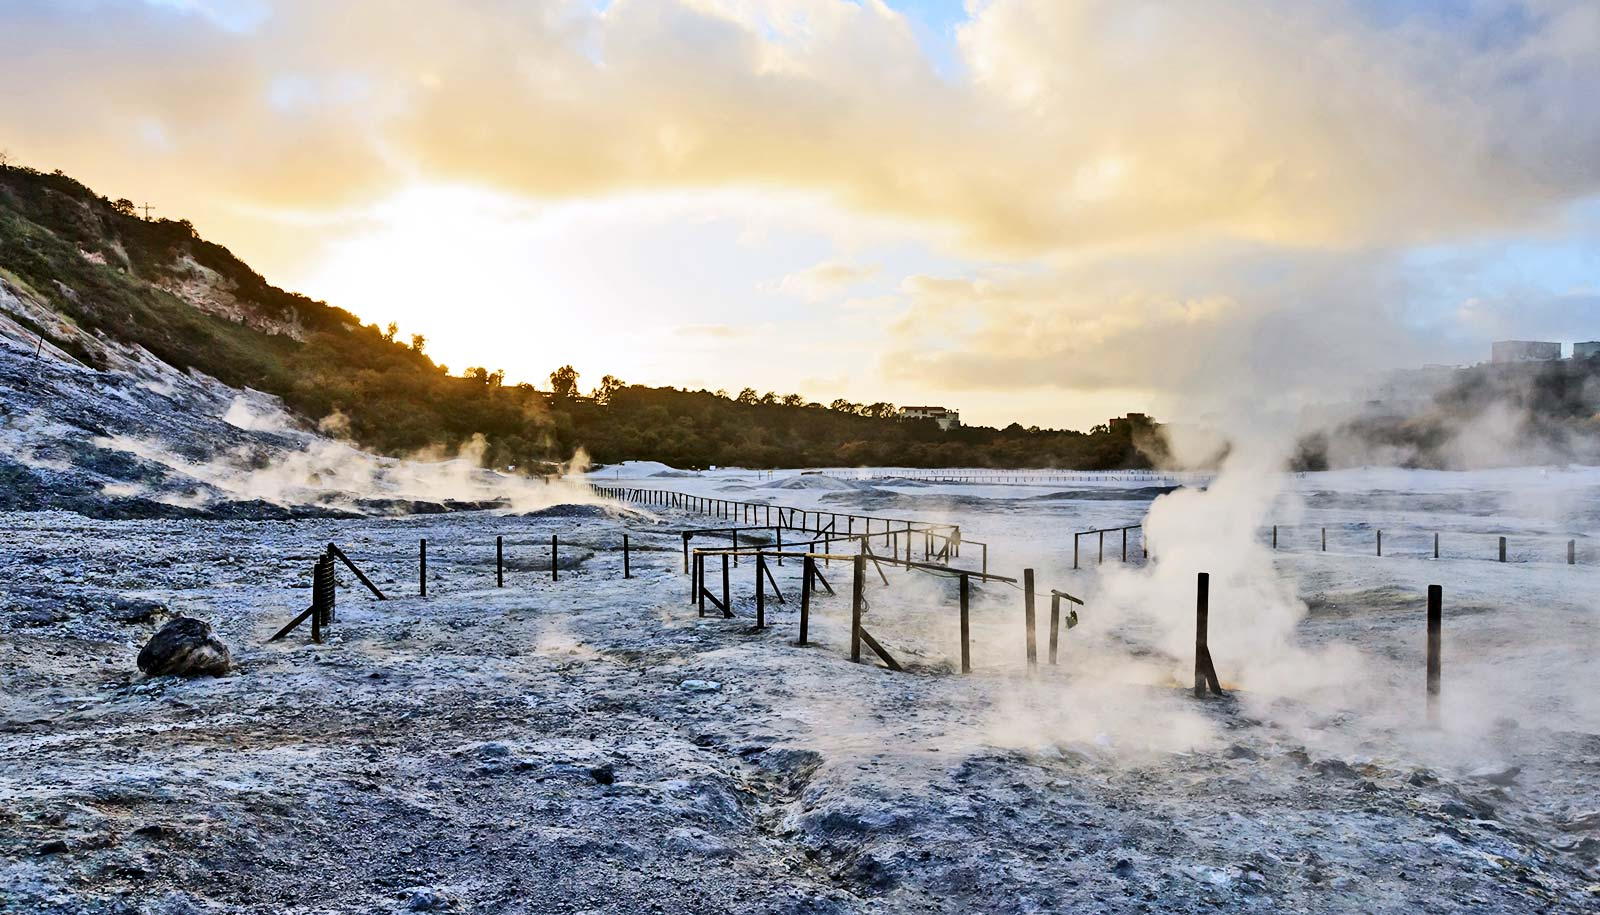 Supervolcano eruption 20,000 years ahead?